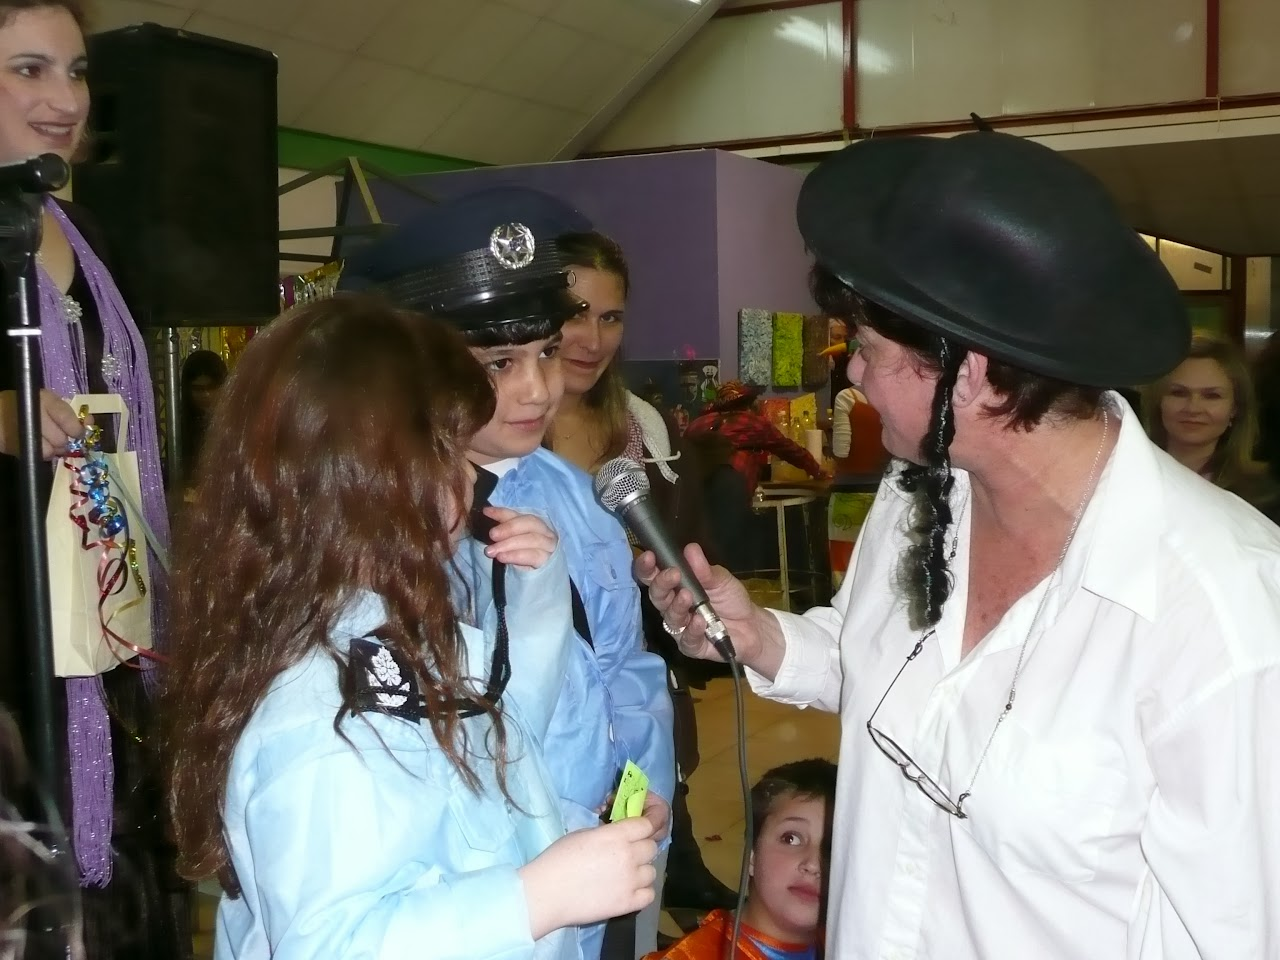 Purim 2008  - 2008-03-20 20.09.48.jpg